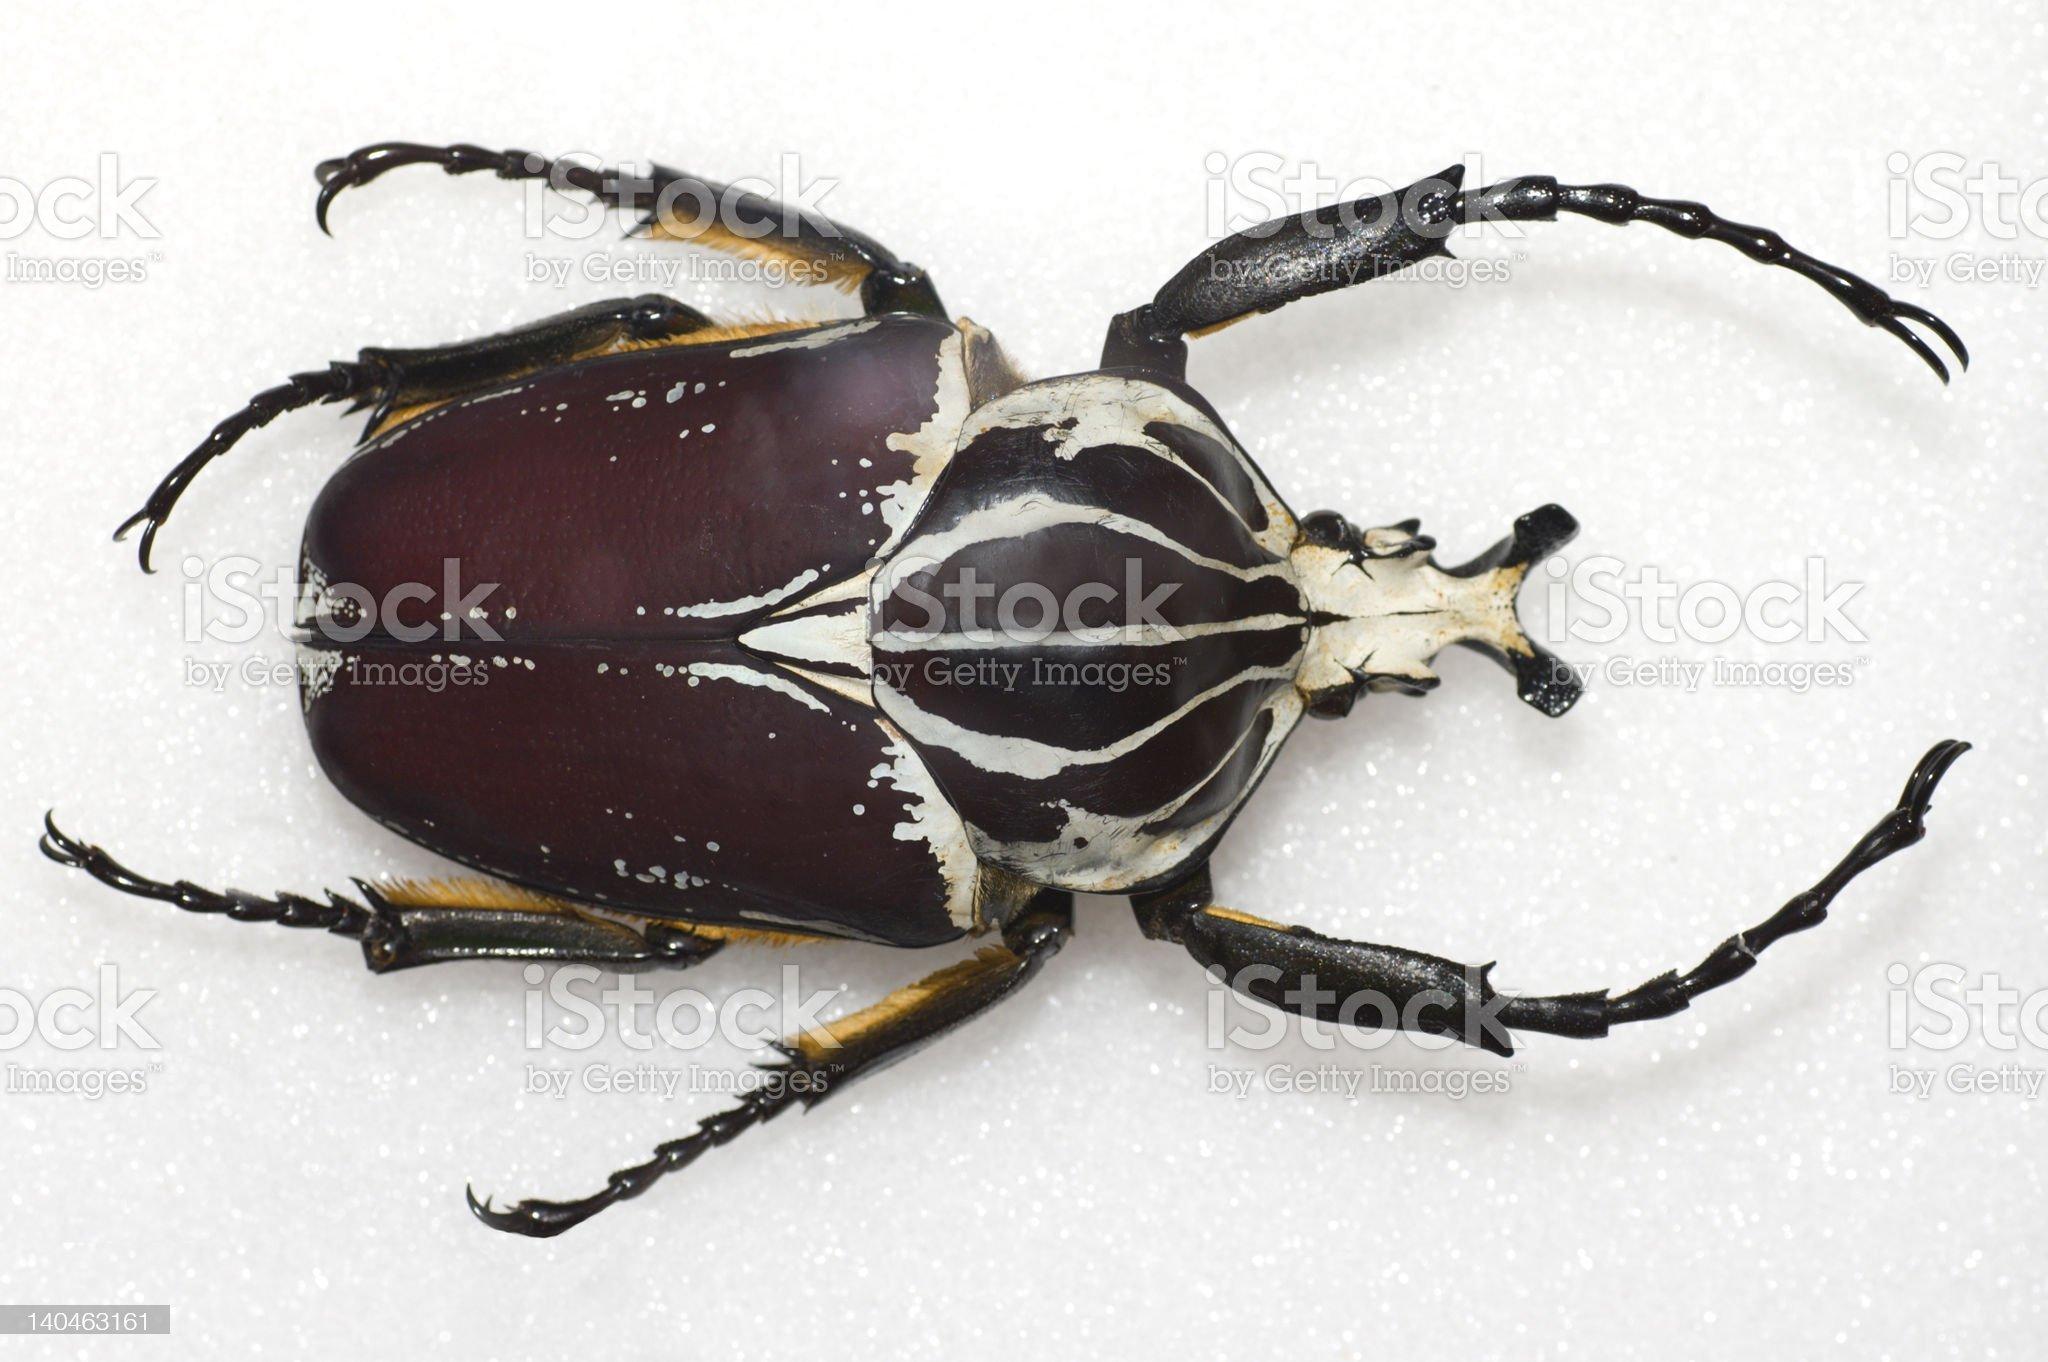 Bug royalty-free stock photo